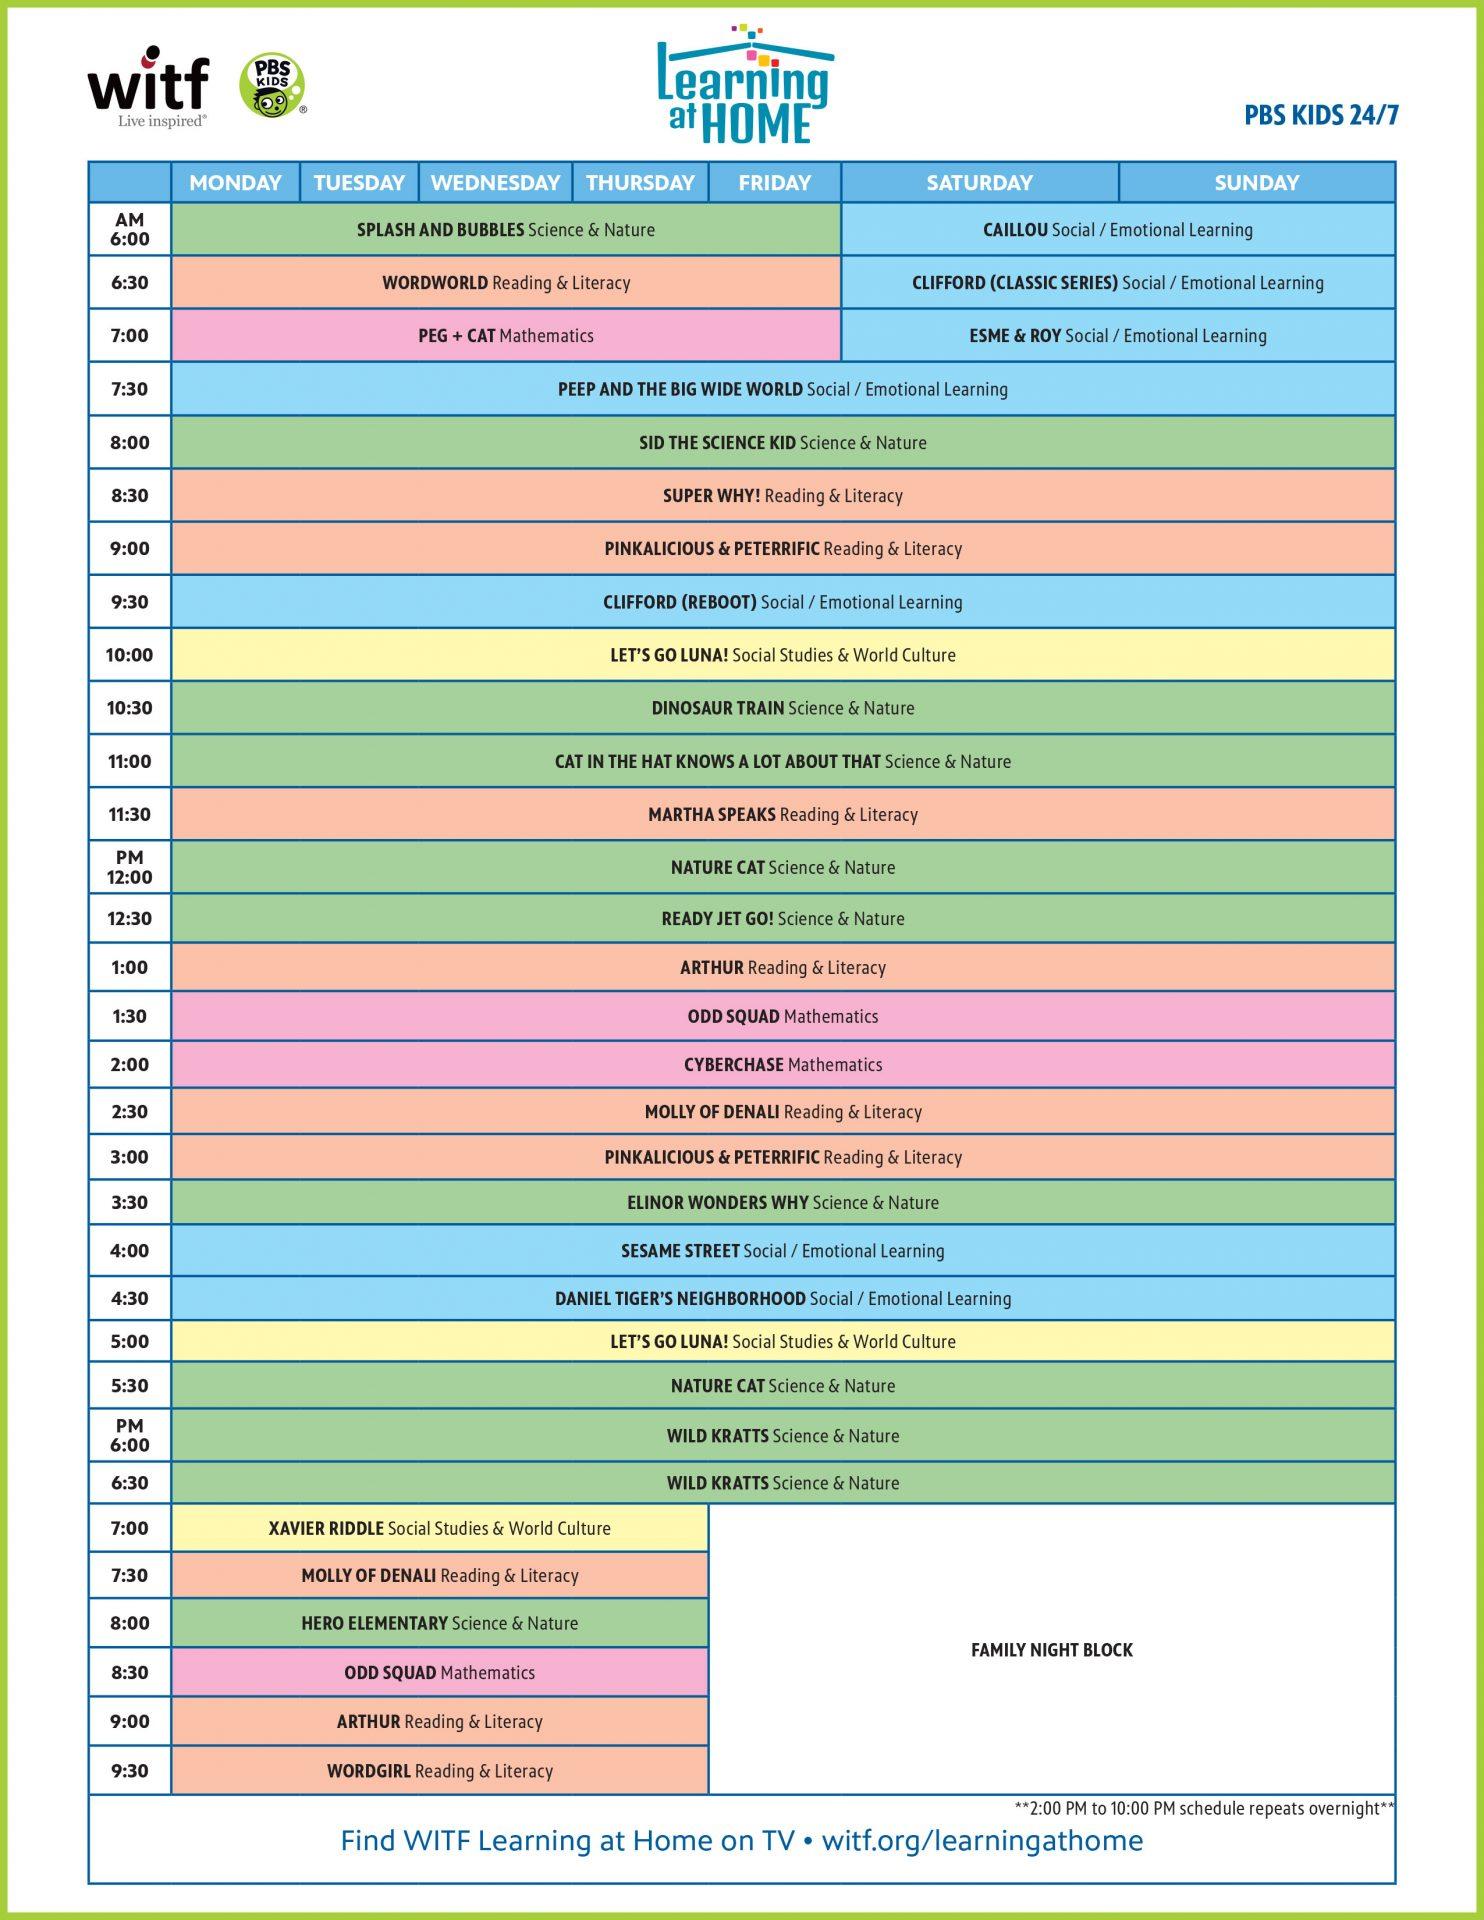 WITF PBS Kids 24/7 Schedule